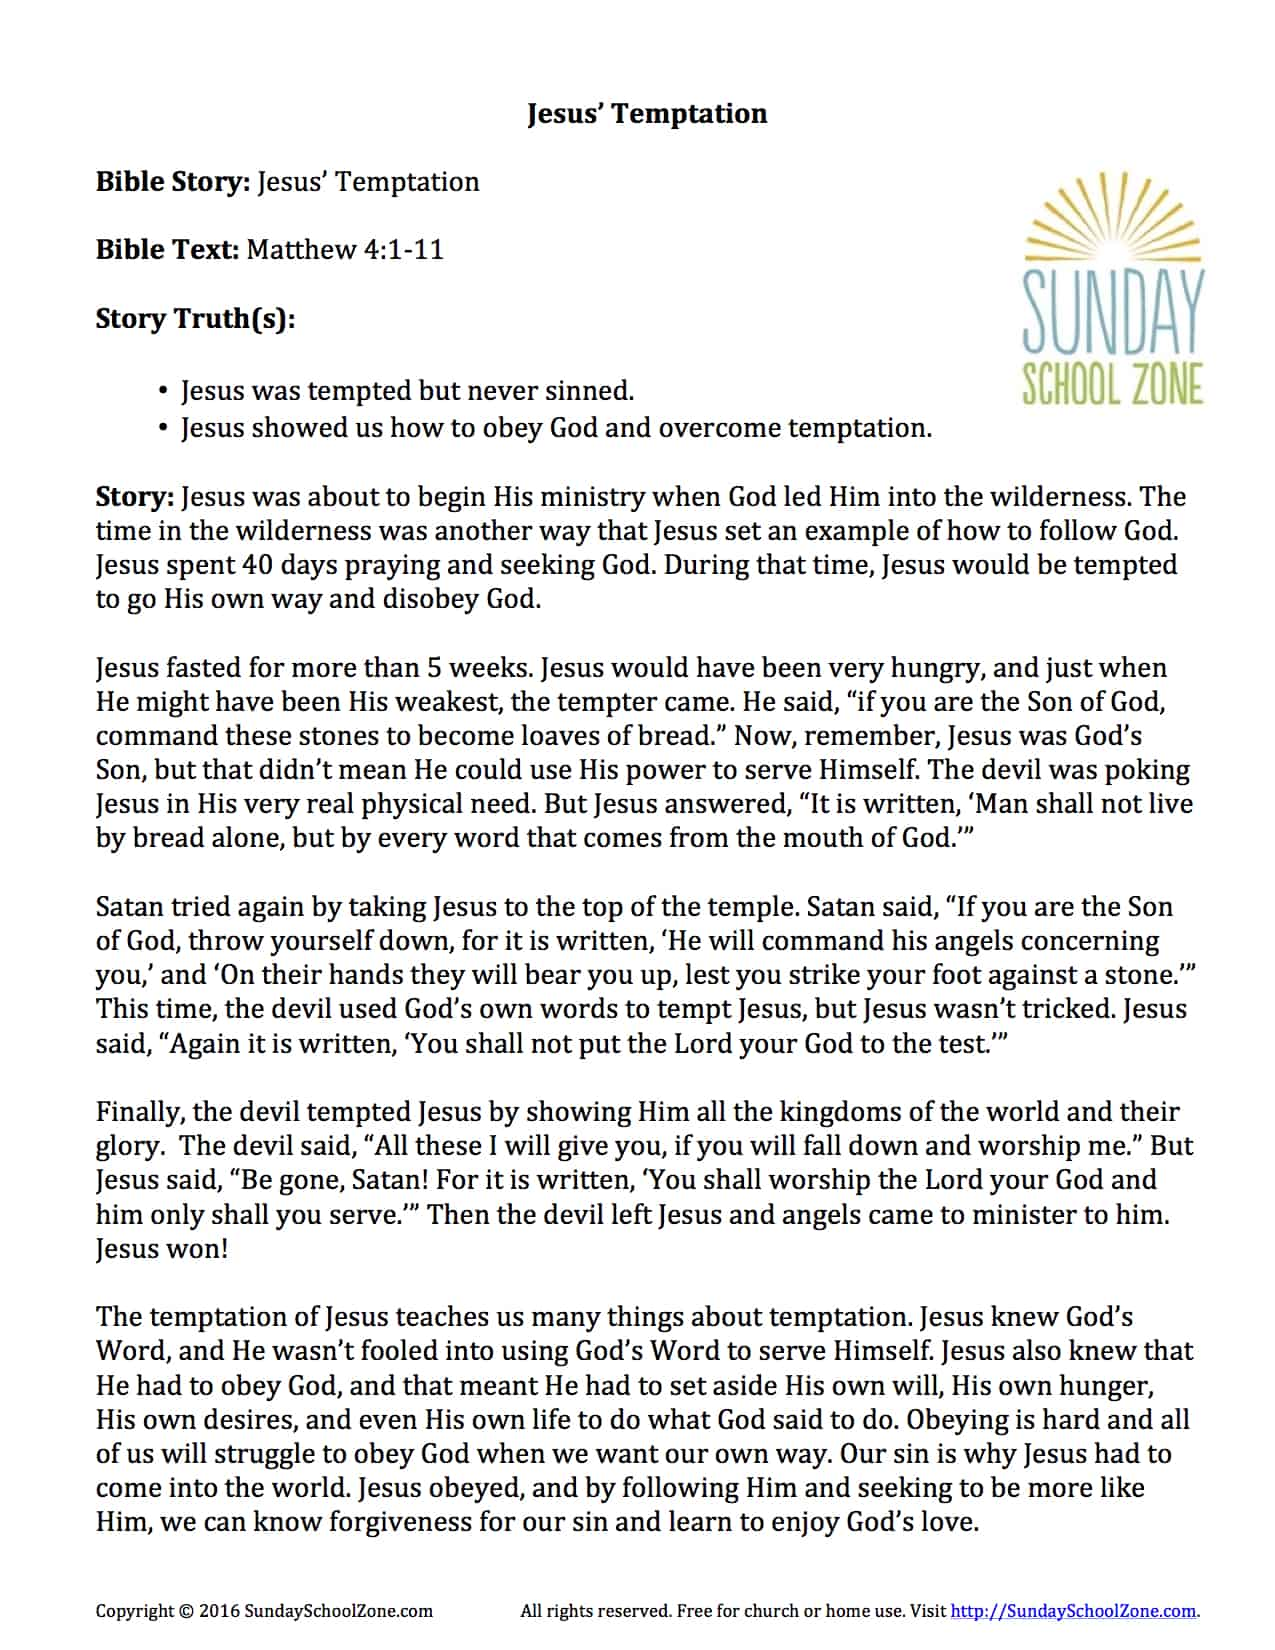 Jesus Temptation Story Summary